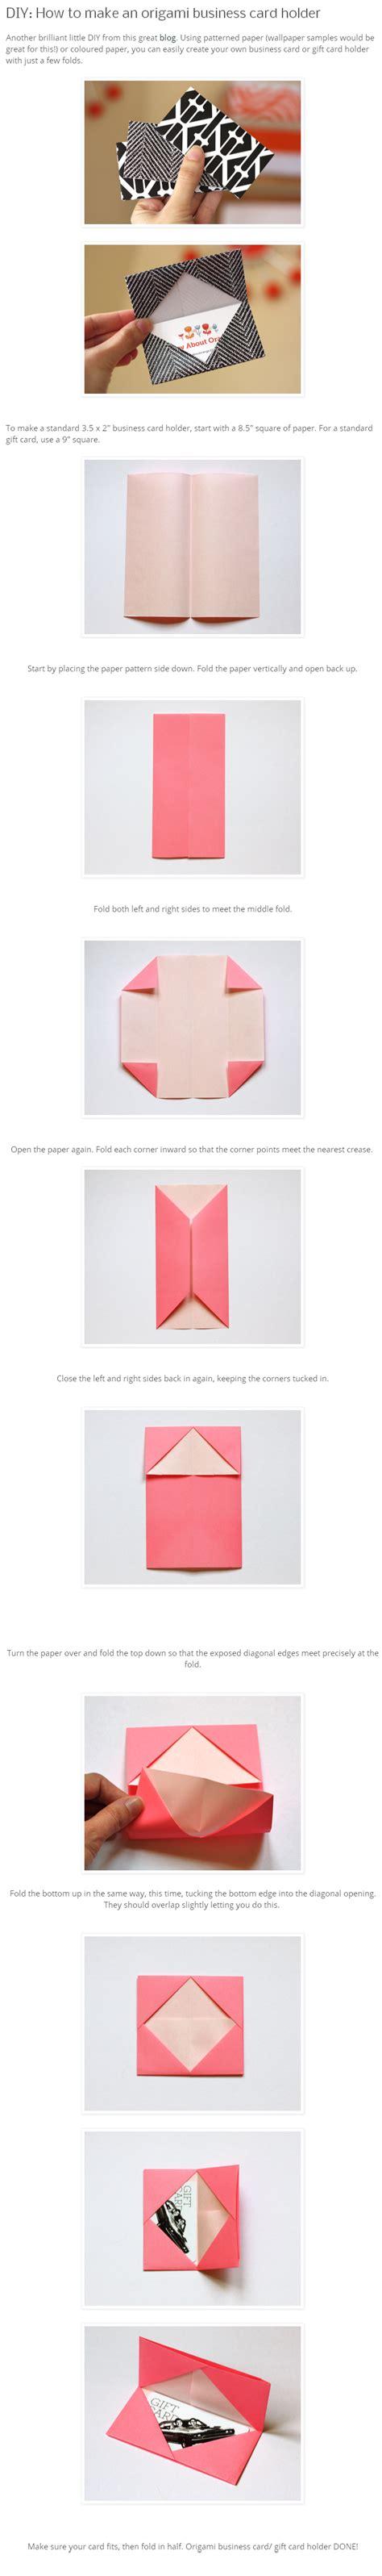 Origami Business Card - diy origami business card holder my style